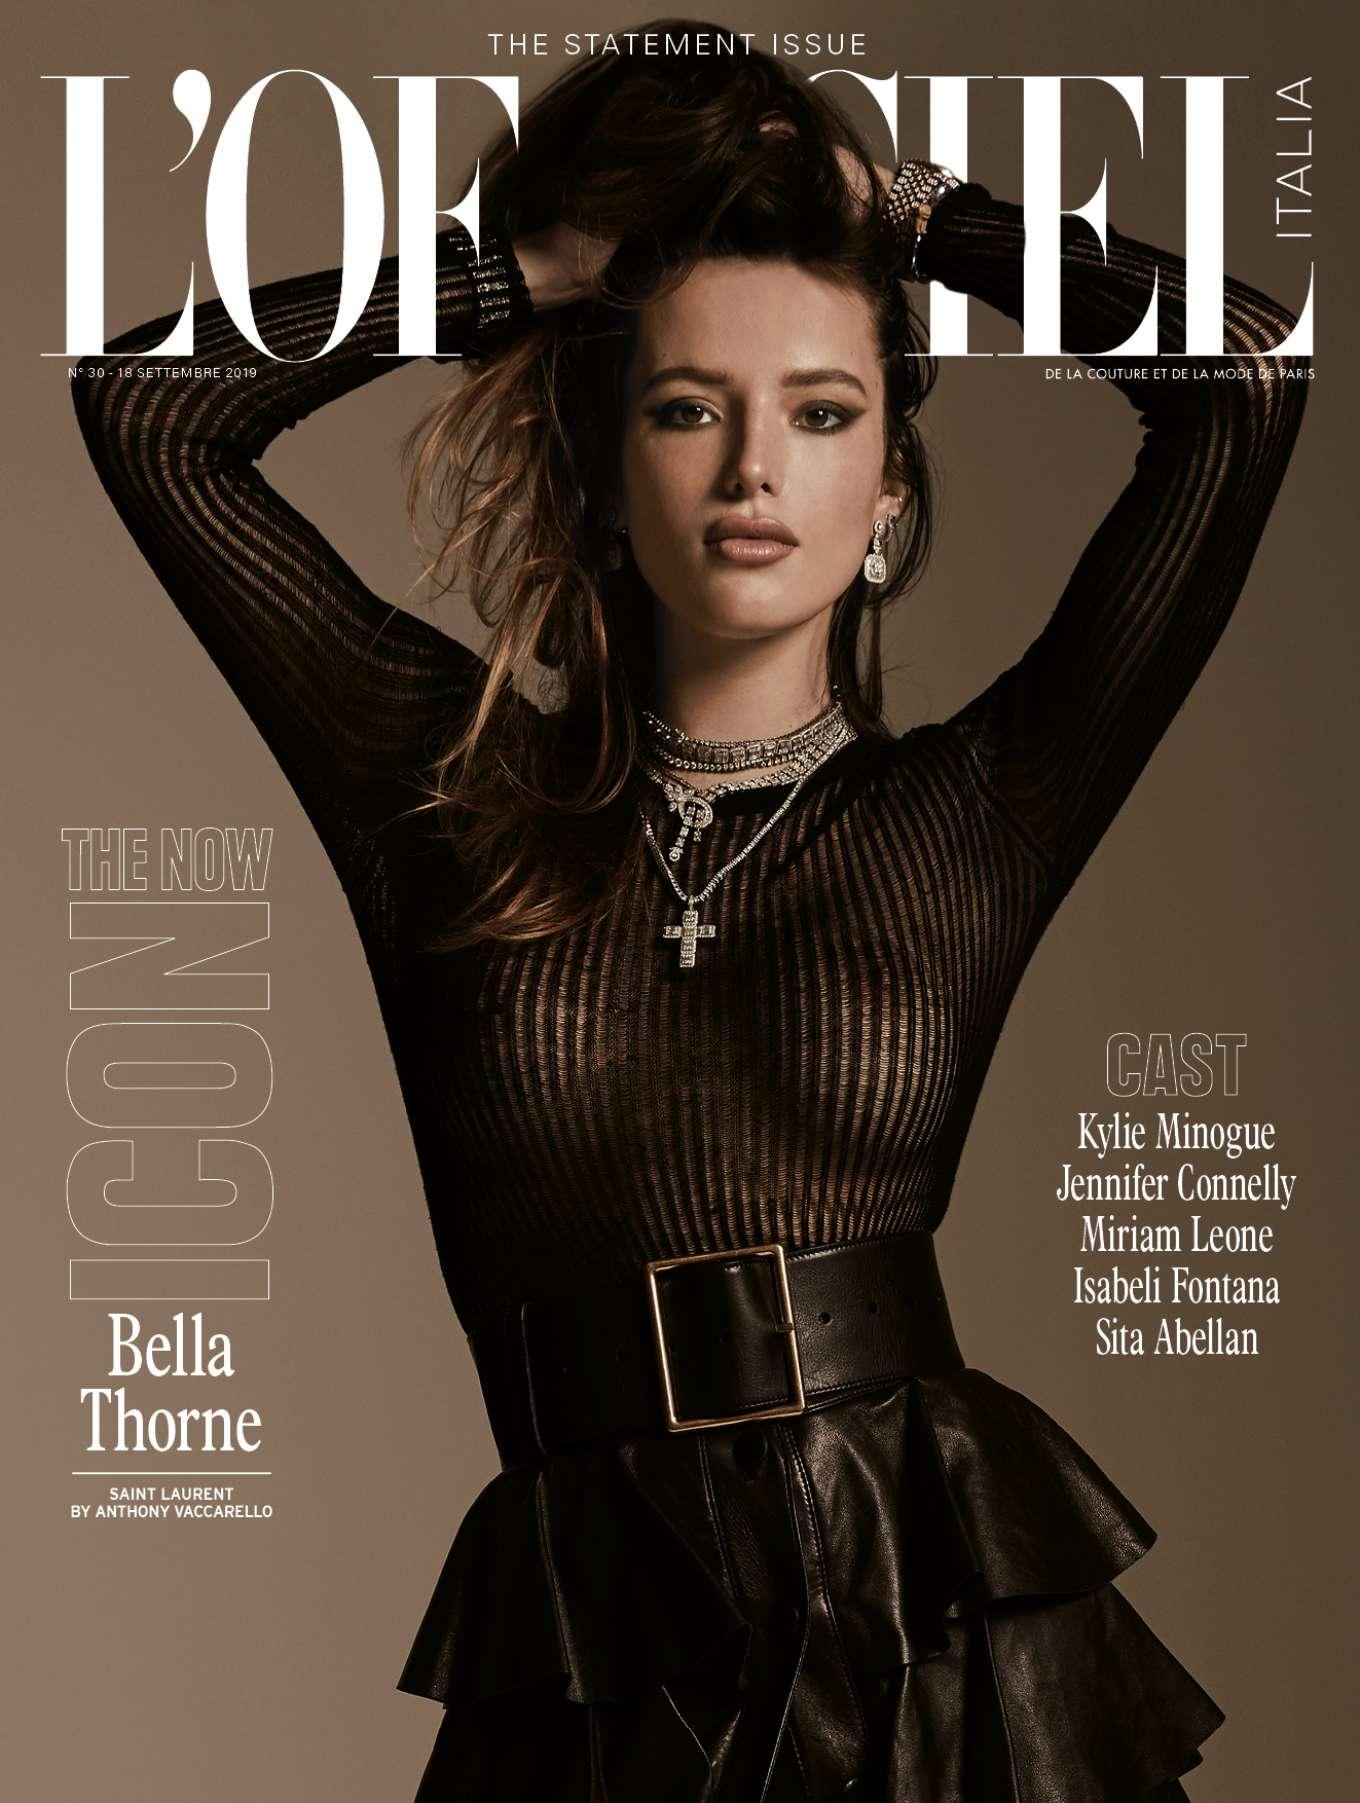 Bella Thorne - L'officiel Italy Cover Magazine (September 2019)